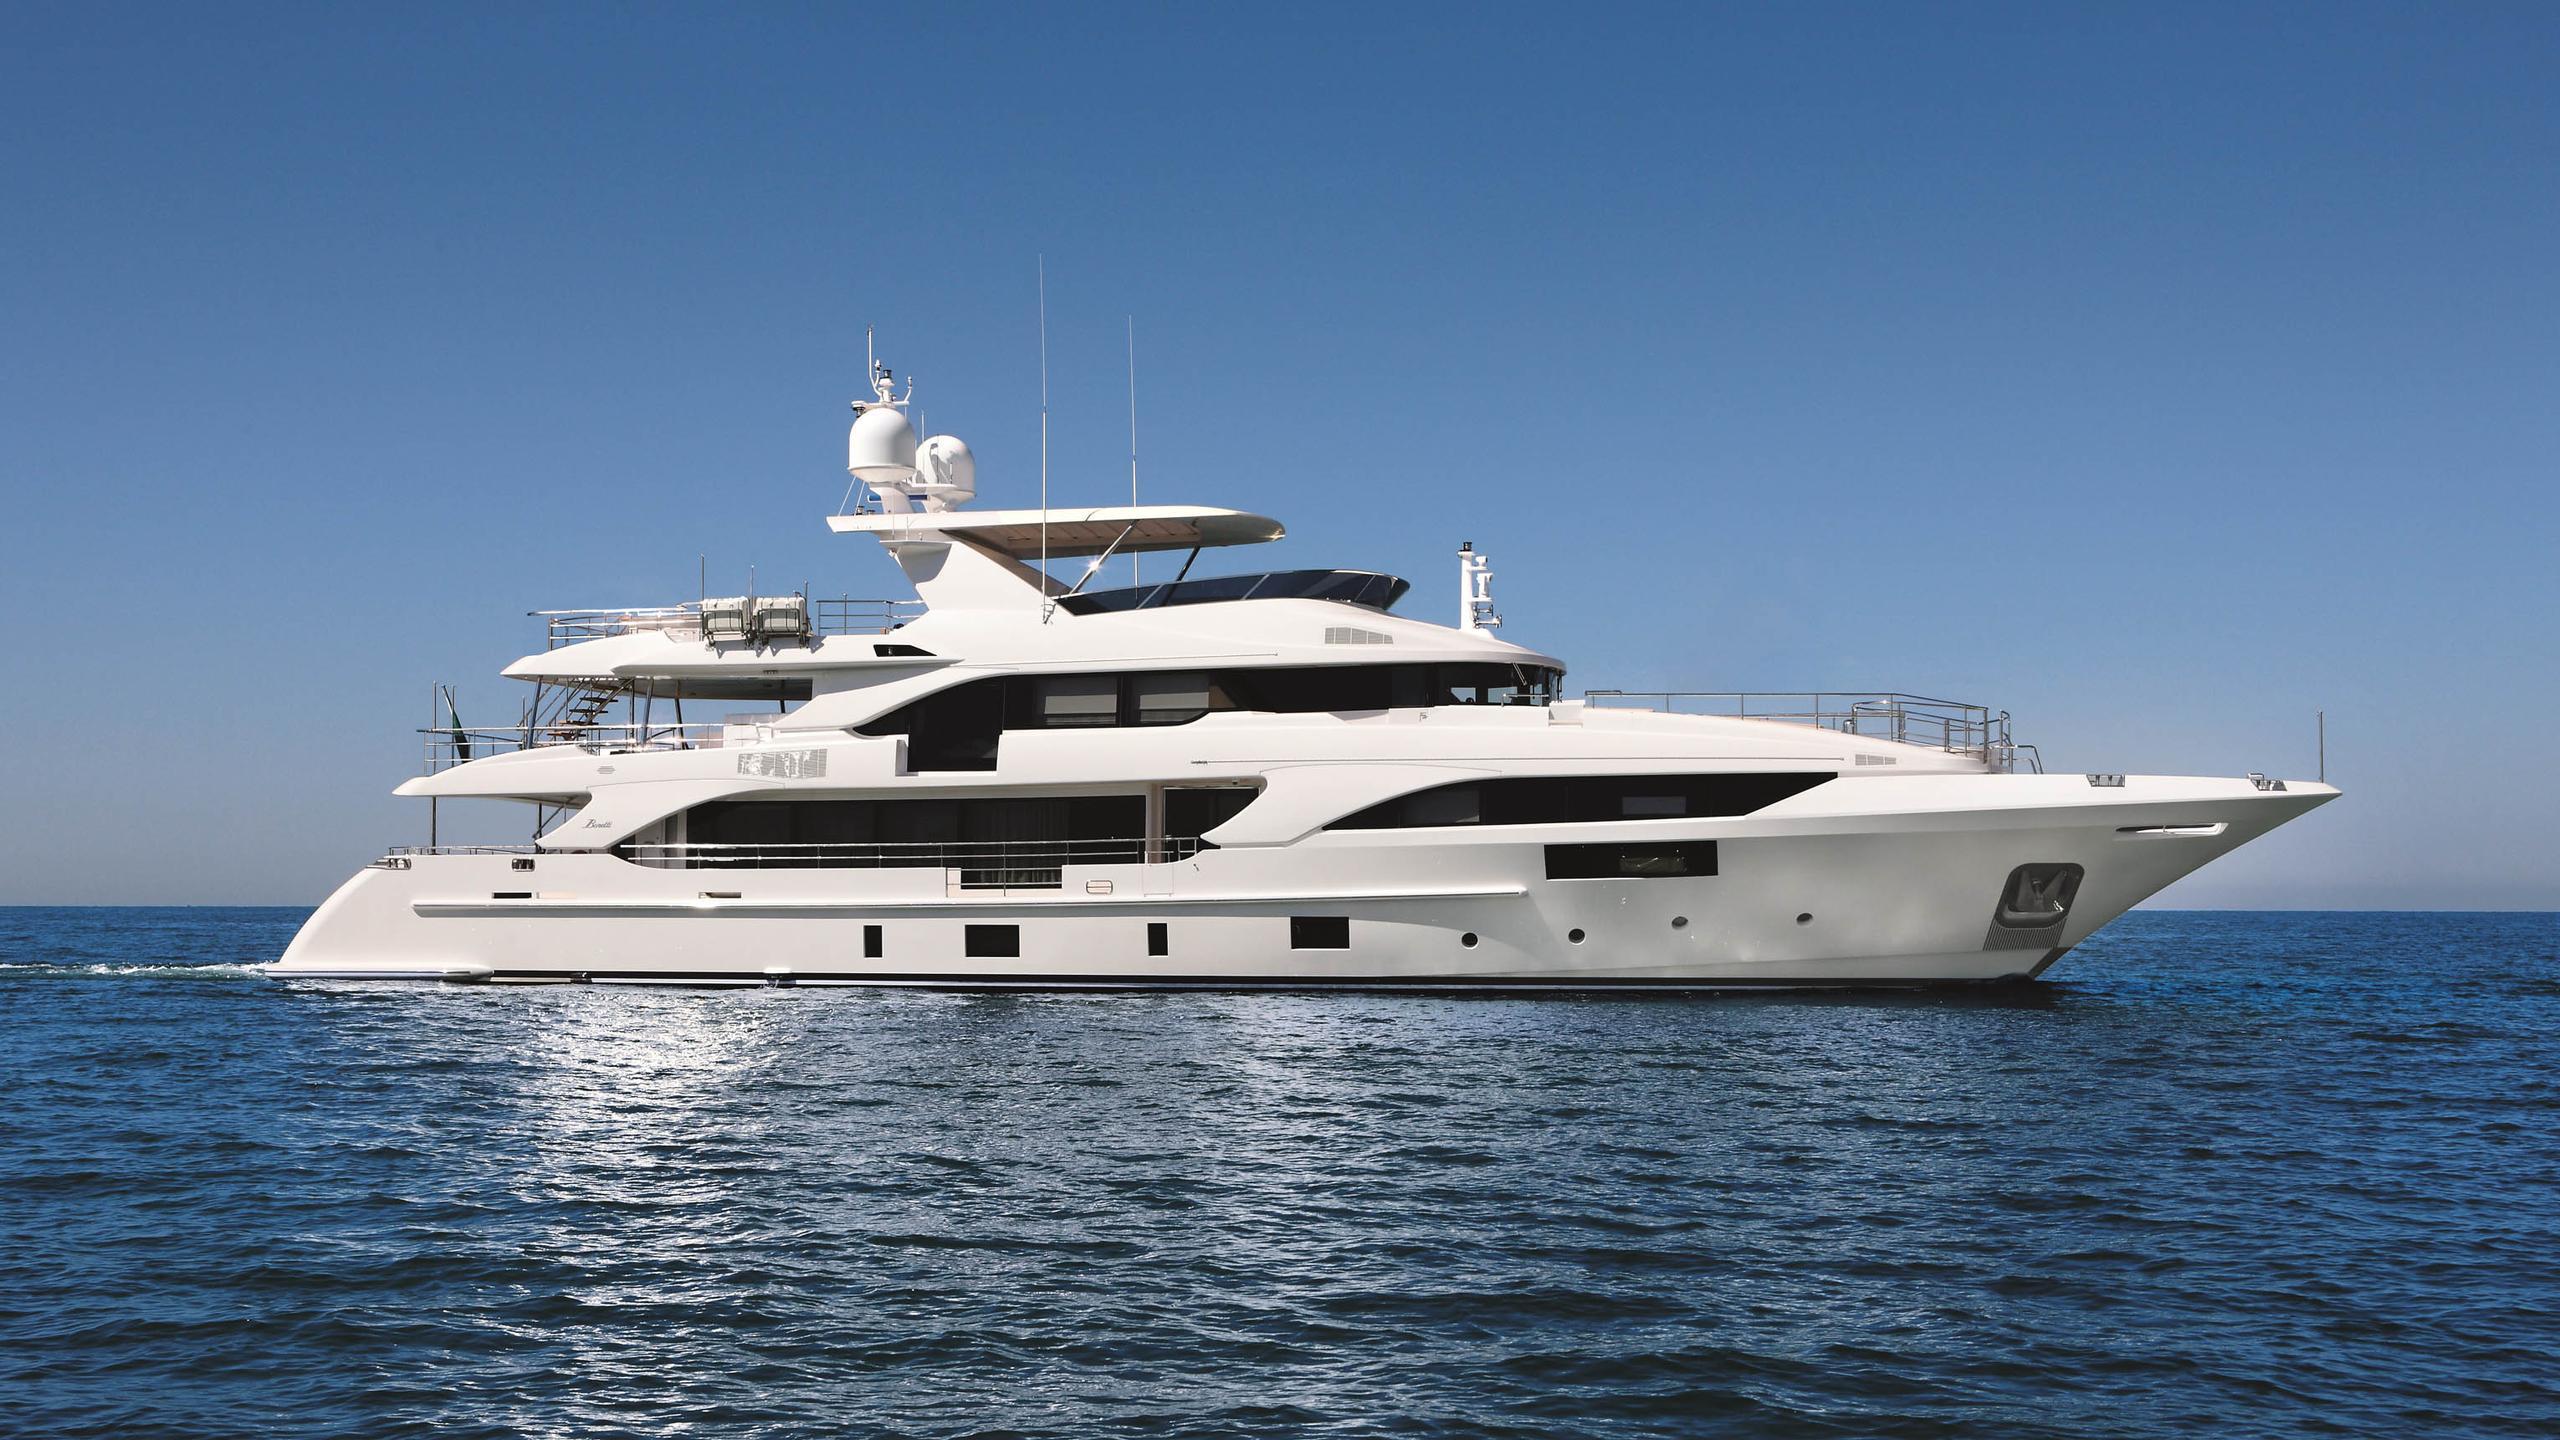 supreme 132 emuna motoryacht benetti yachts 40m 2016 profile sistership